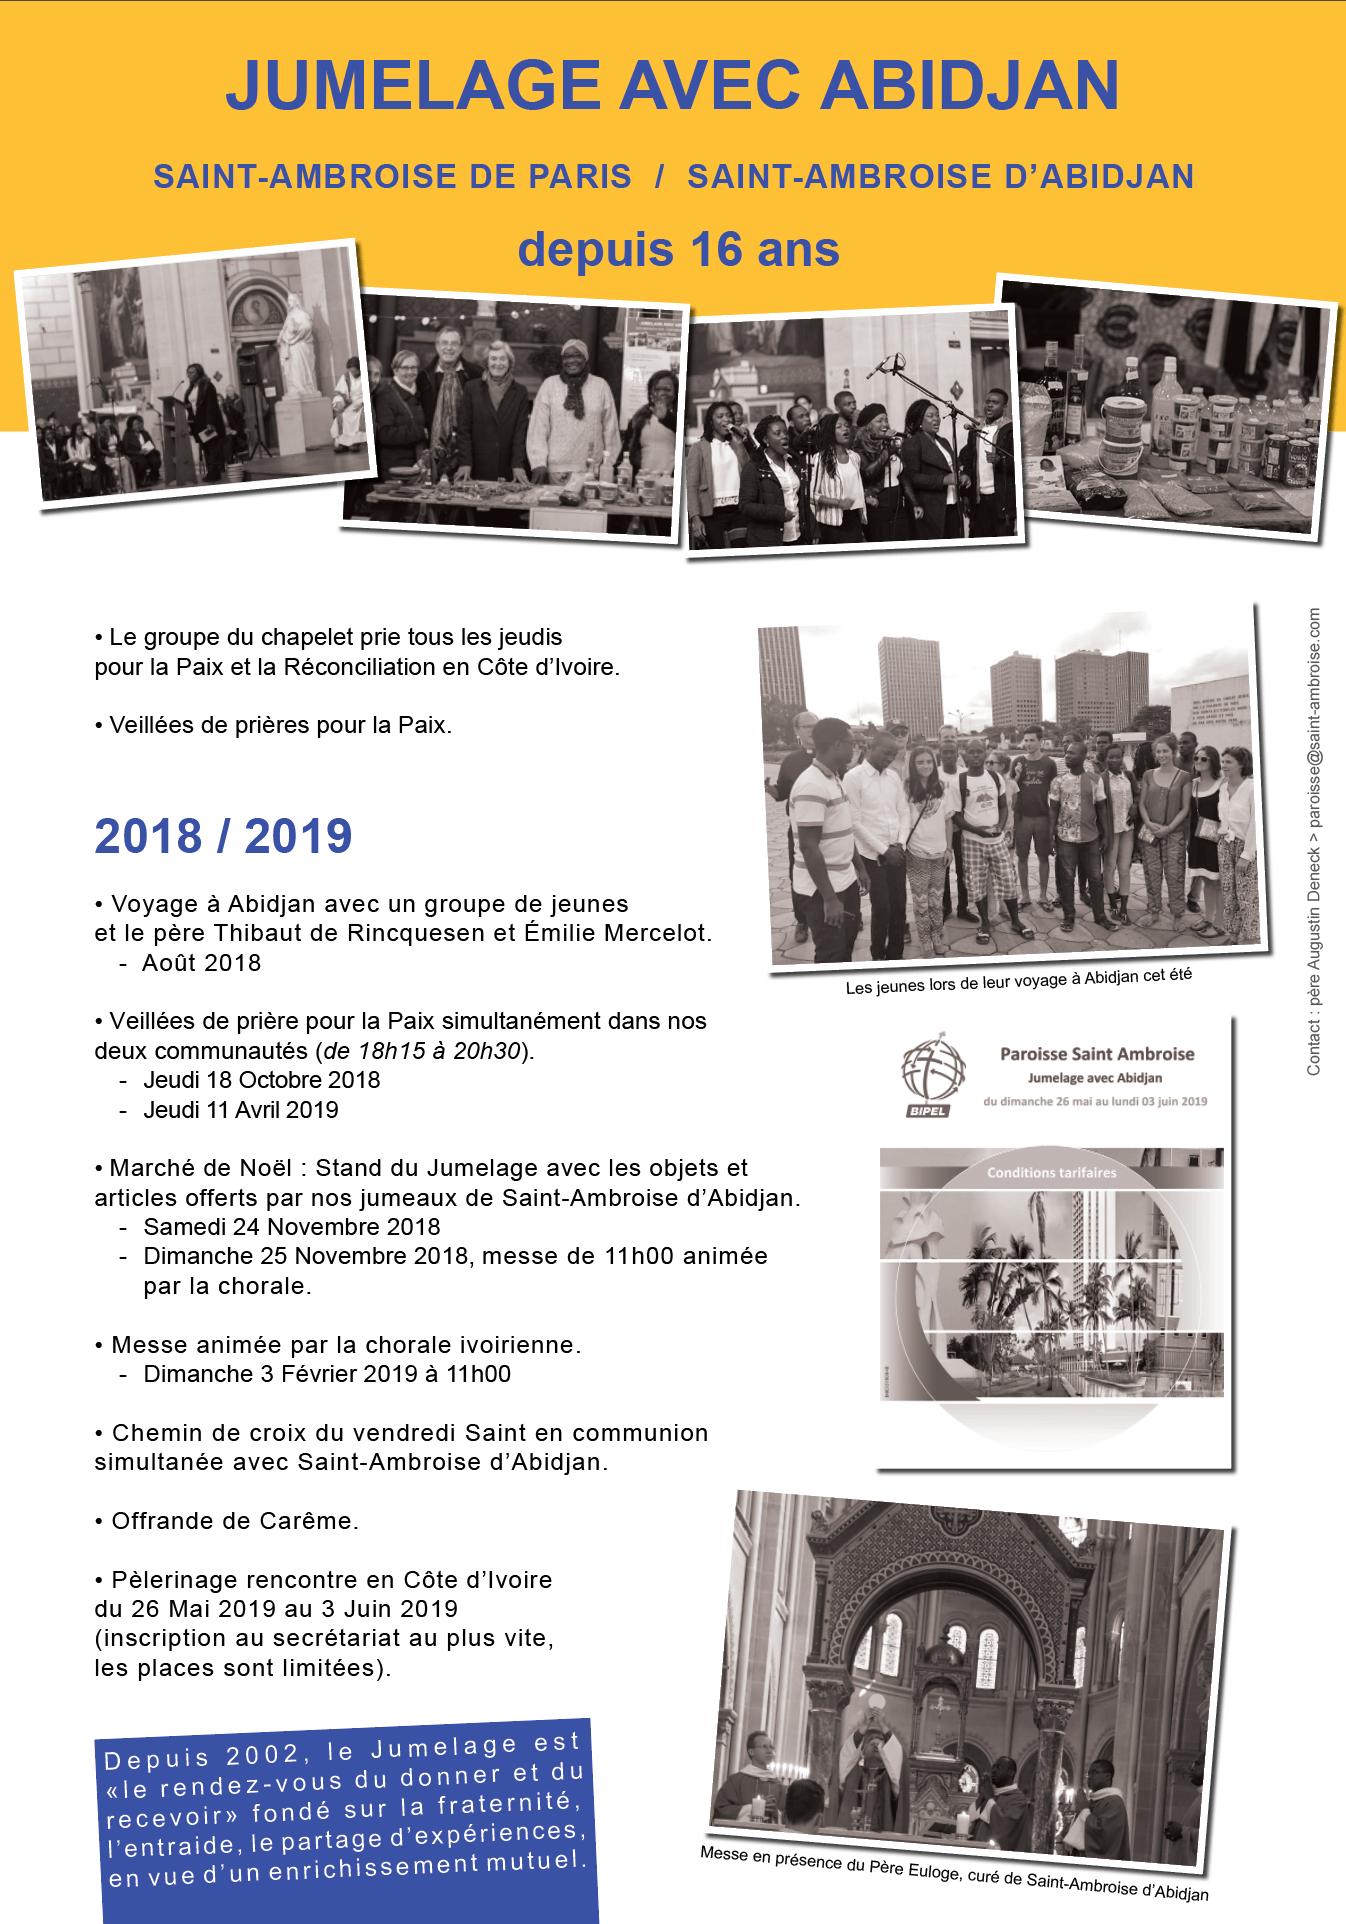 Panneau jumelage Abidjan 2018 2019